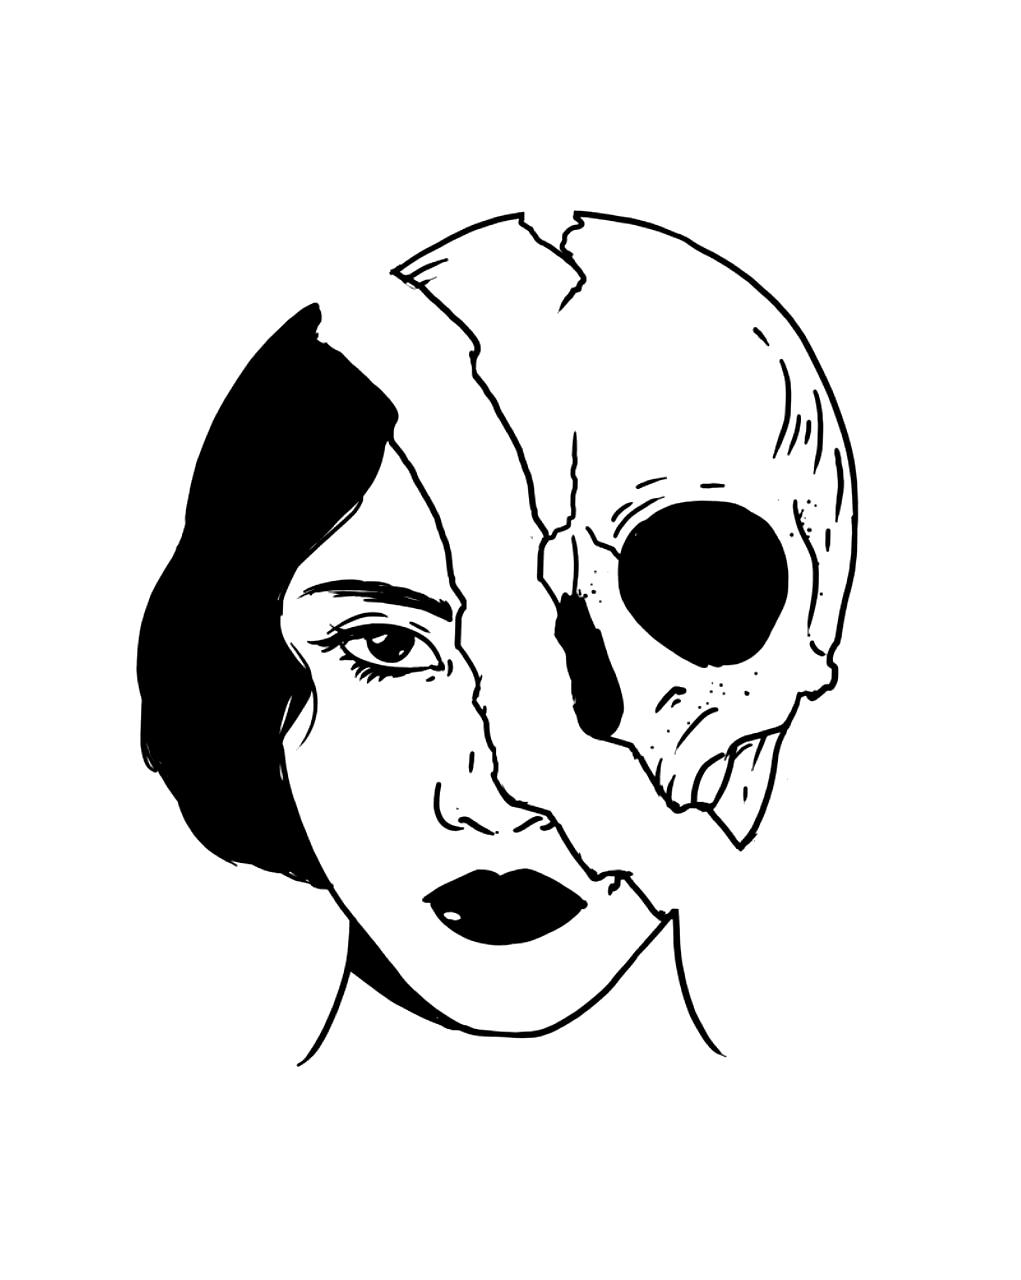 b8bf5a4c08f7a8839995f877f83b81fb » Aesthetic Tumblr Drawings